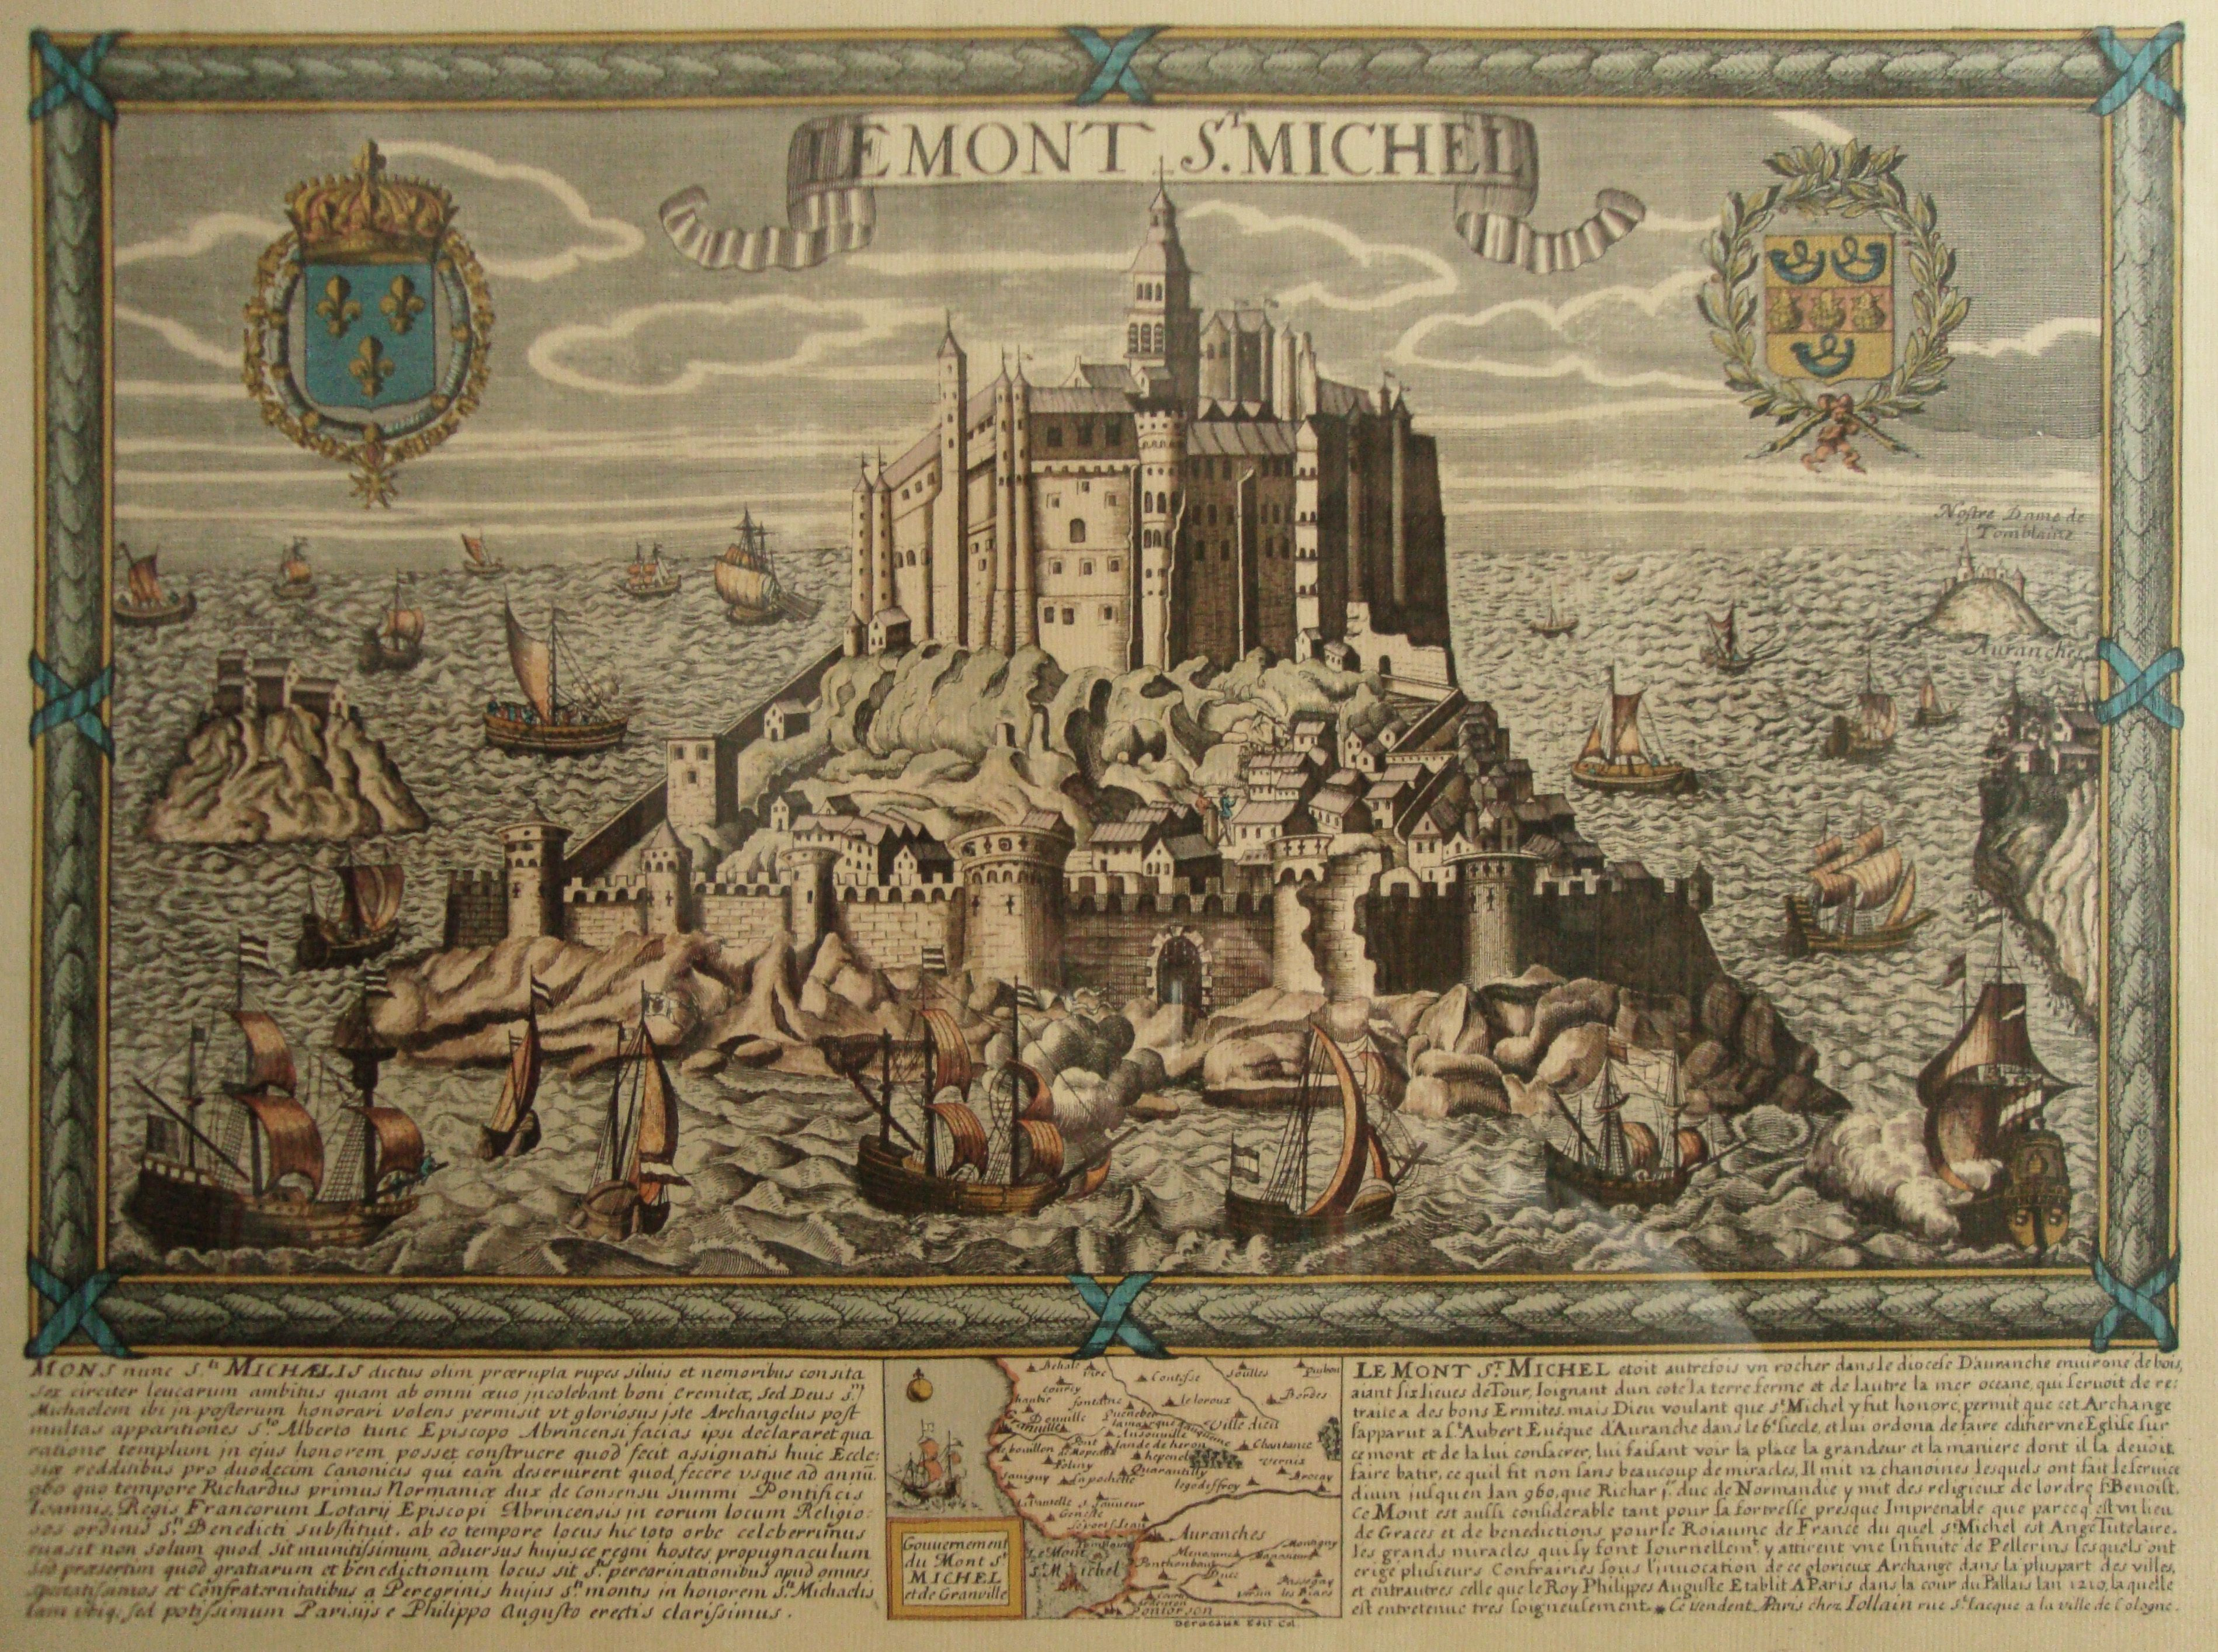 copy free image of mont st michel